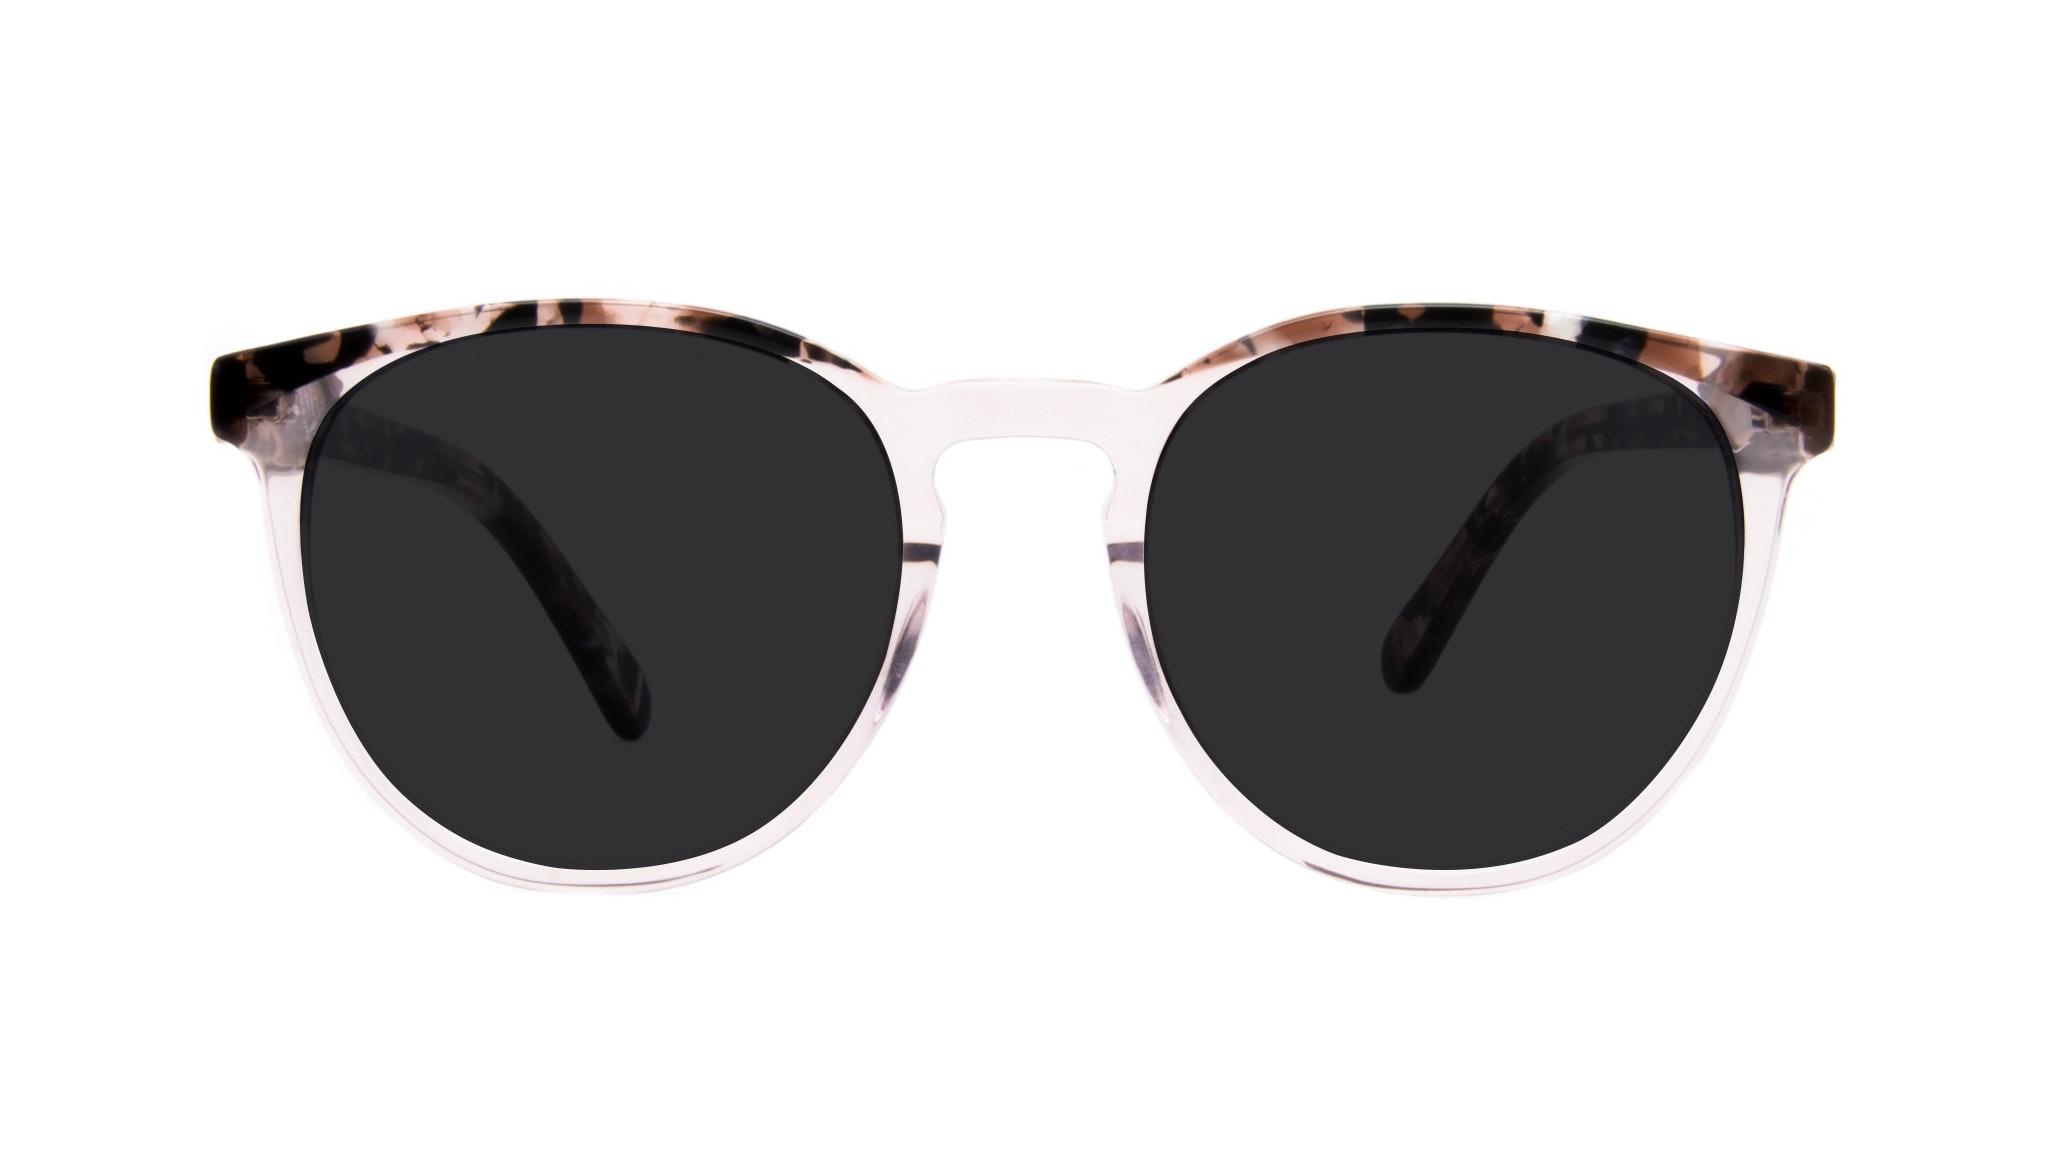 Affordable Fashion Glasses Round Eyeglasses Women Brilliant Rose Tort